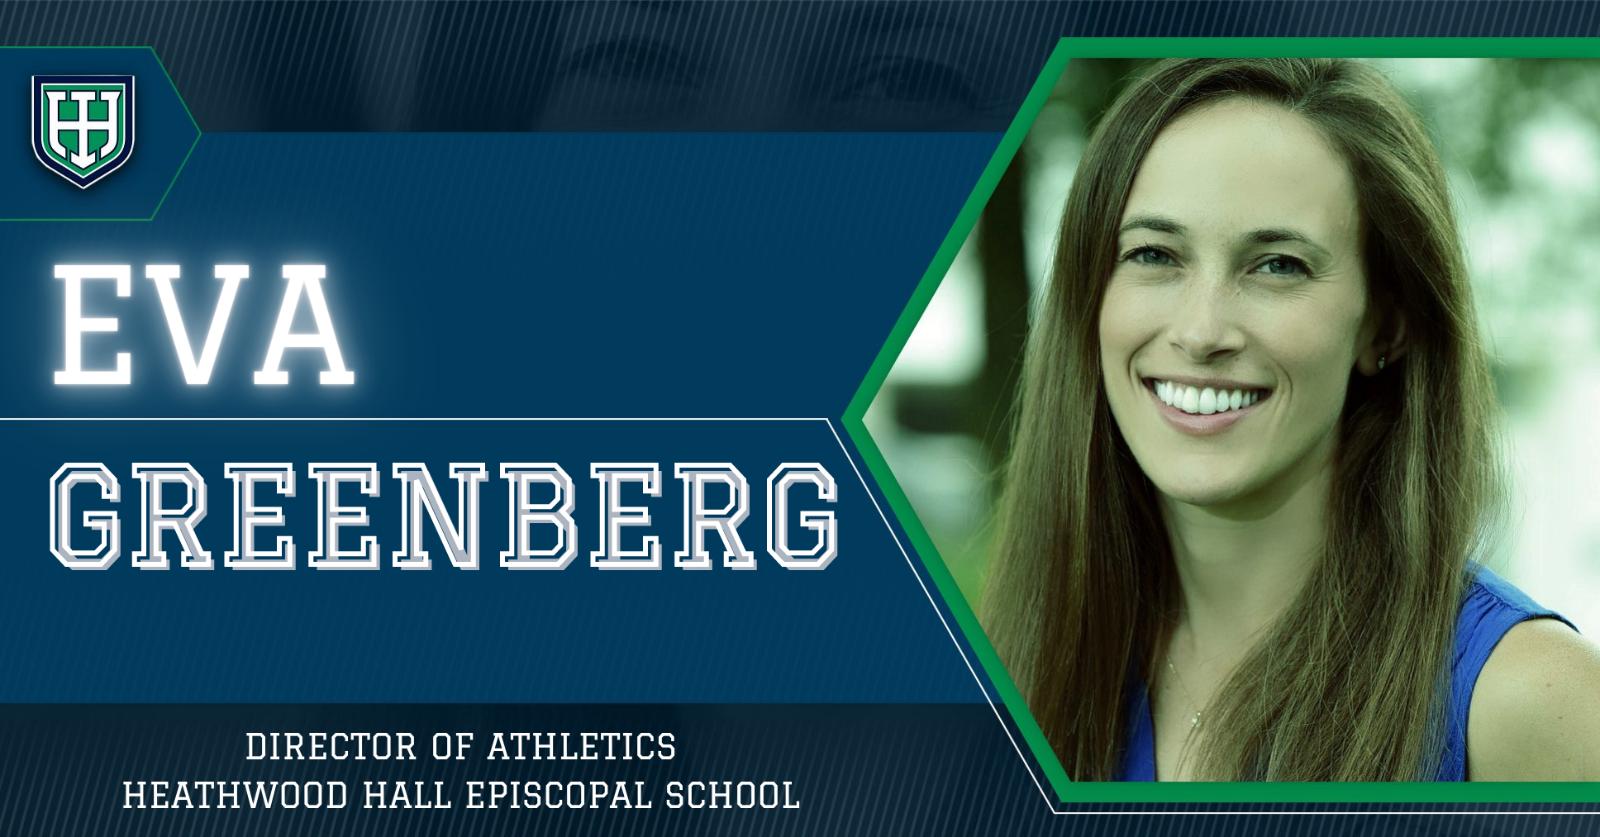 Heathwood Hall Welcomes New Director of Athletics Eva Greenberg